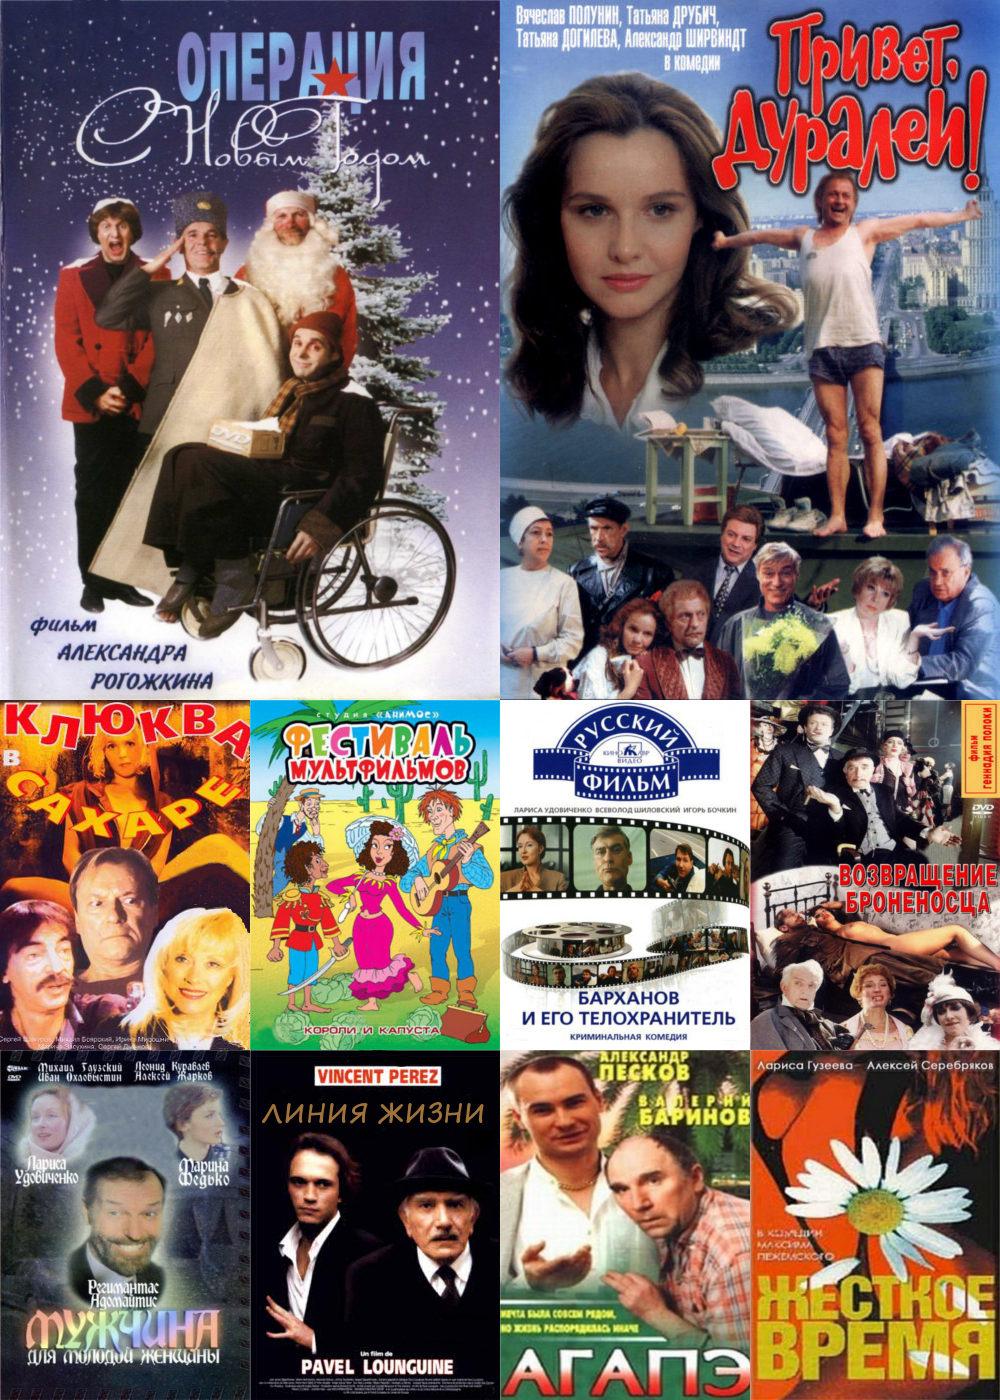 1996-bestrucomedy